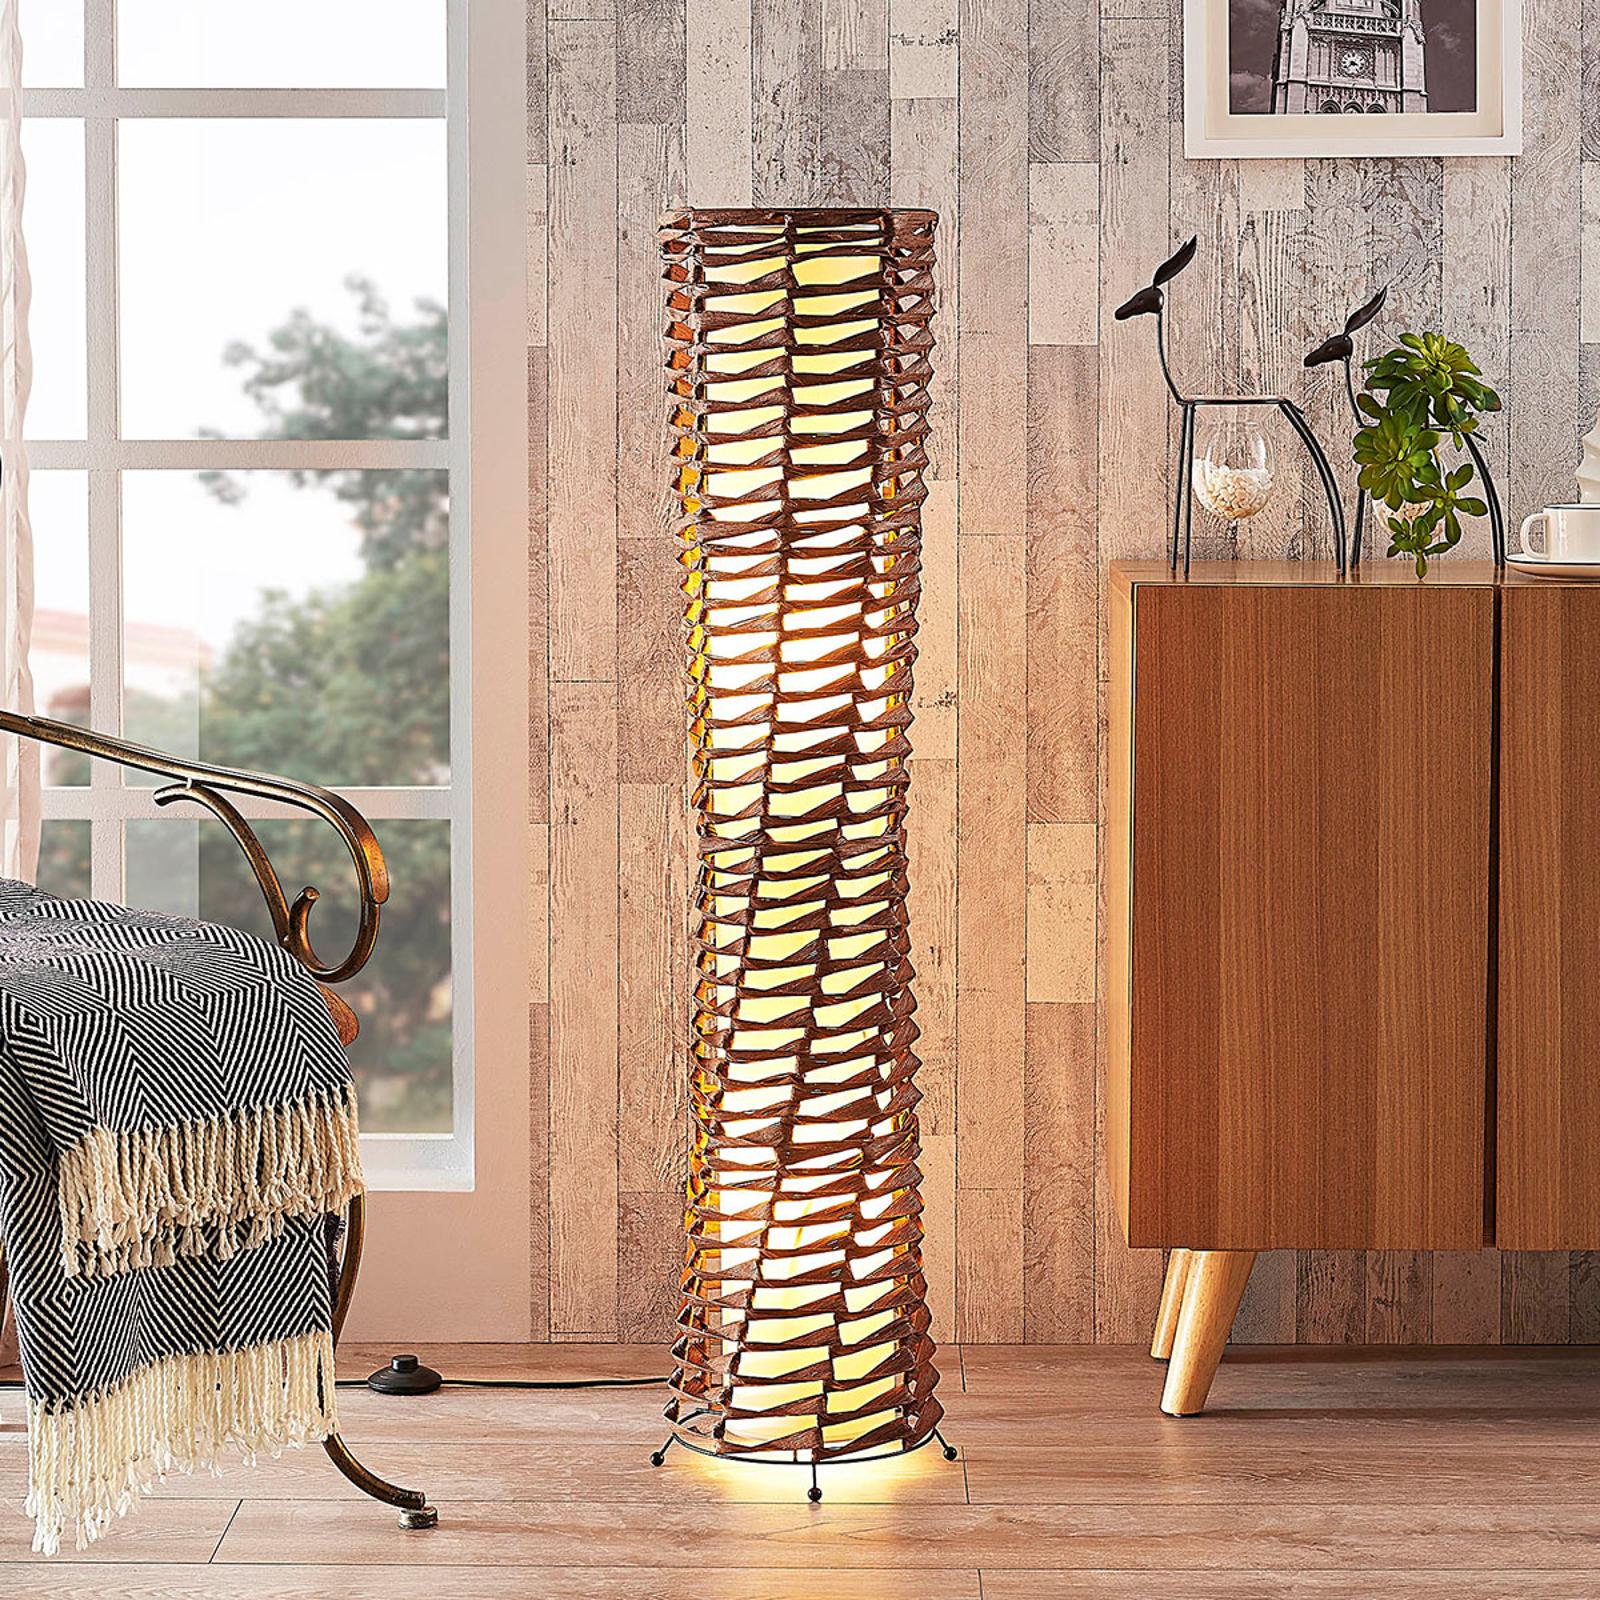 Decoratieve woonkamer-vloerlamp Joas in bruin